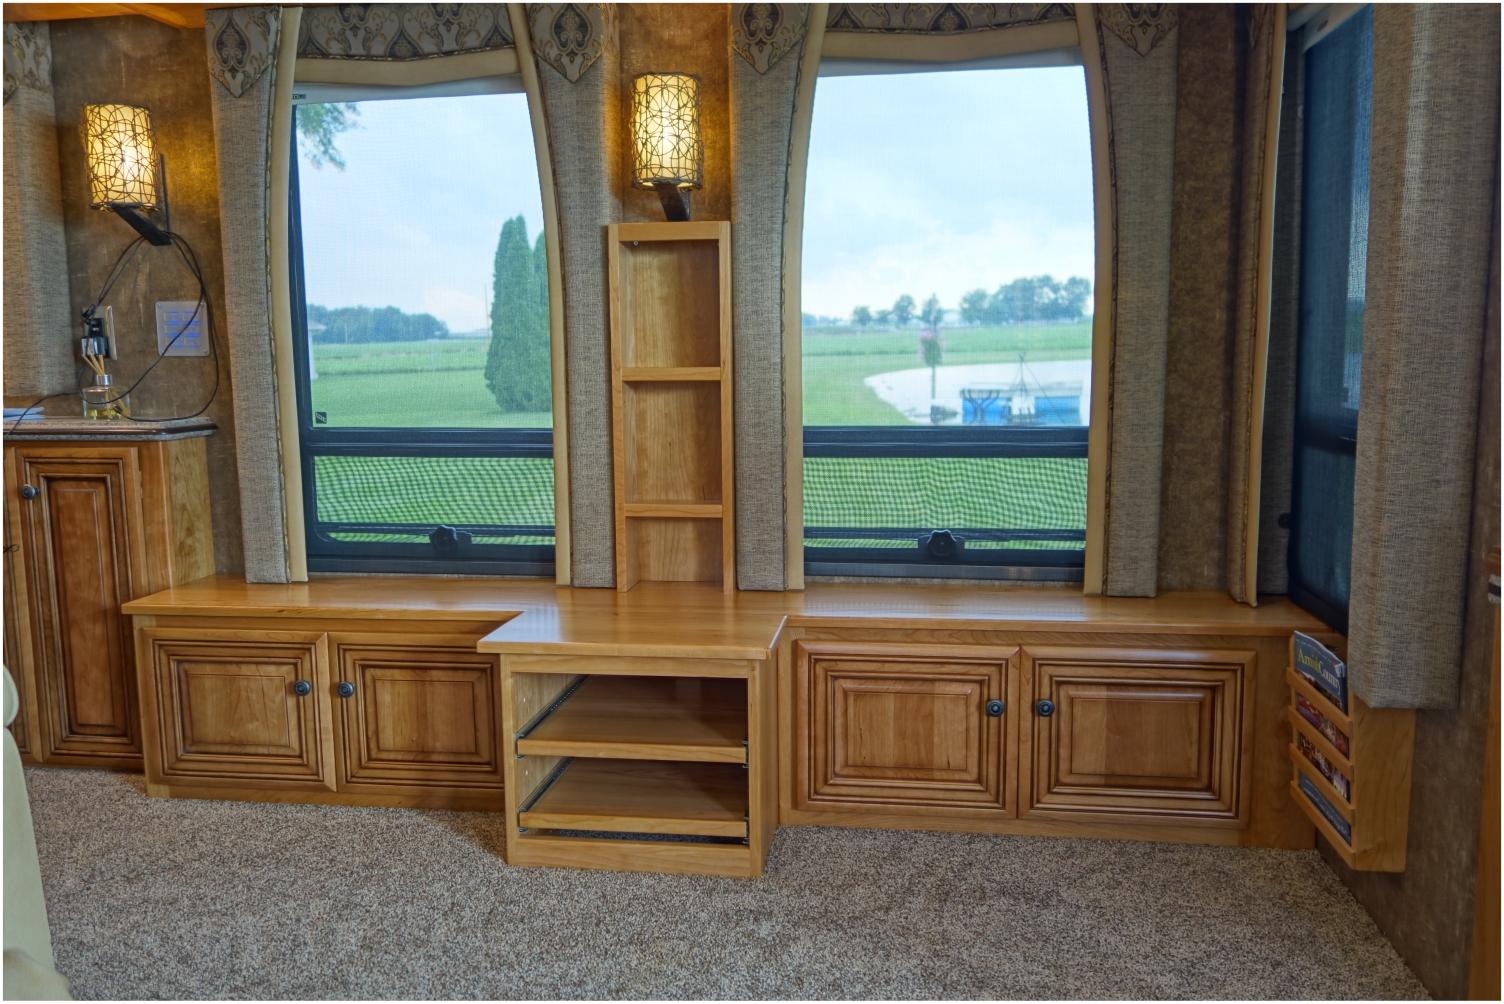 Custom cabinets built around windows